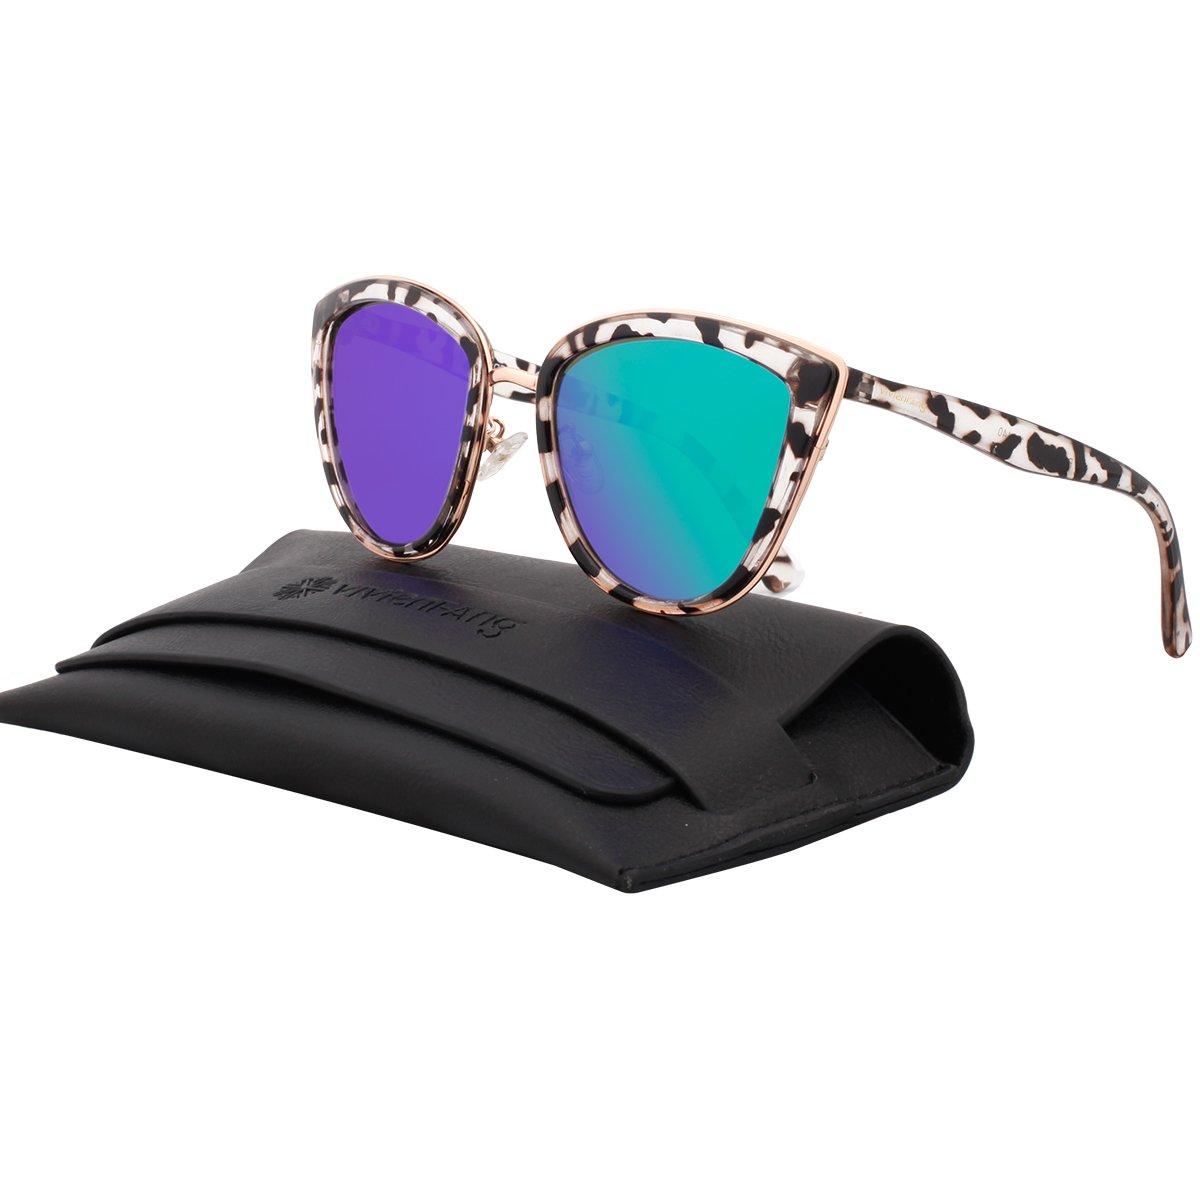 VIVIENFANG Women's Flash Mirror Lens Oversize Polarized Cateye Sunglasses P1891E Smoke Demi